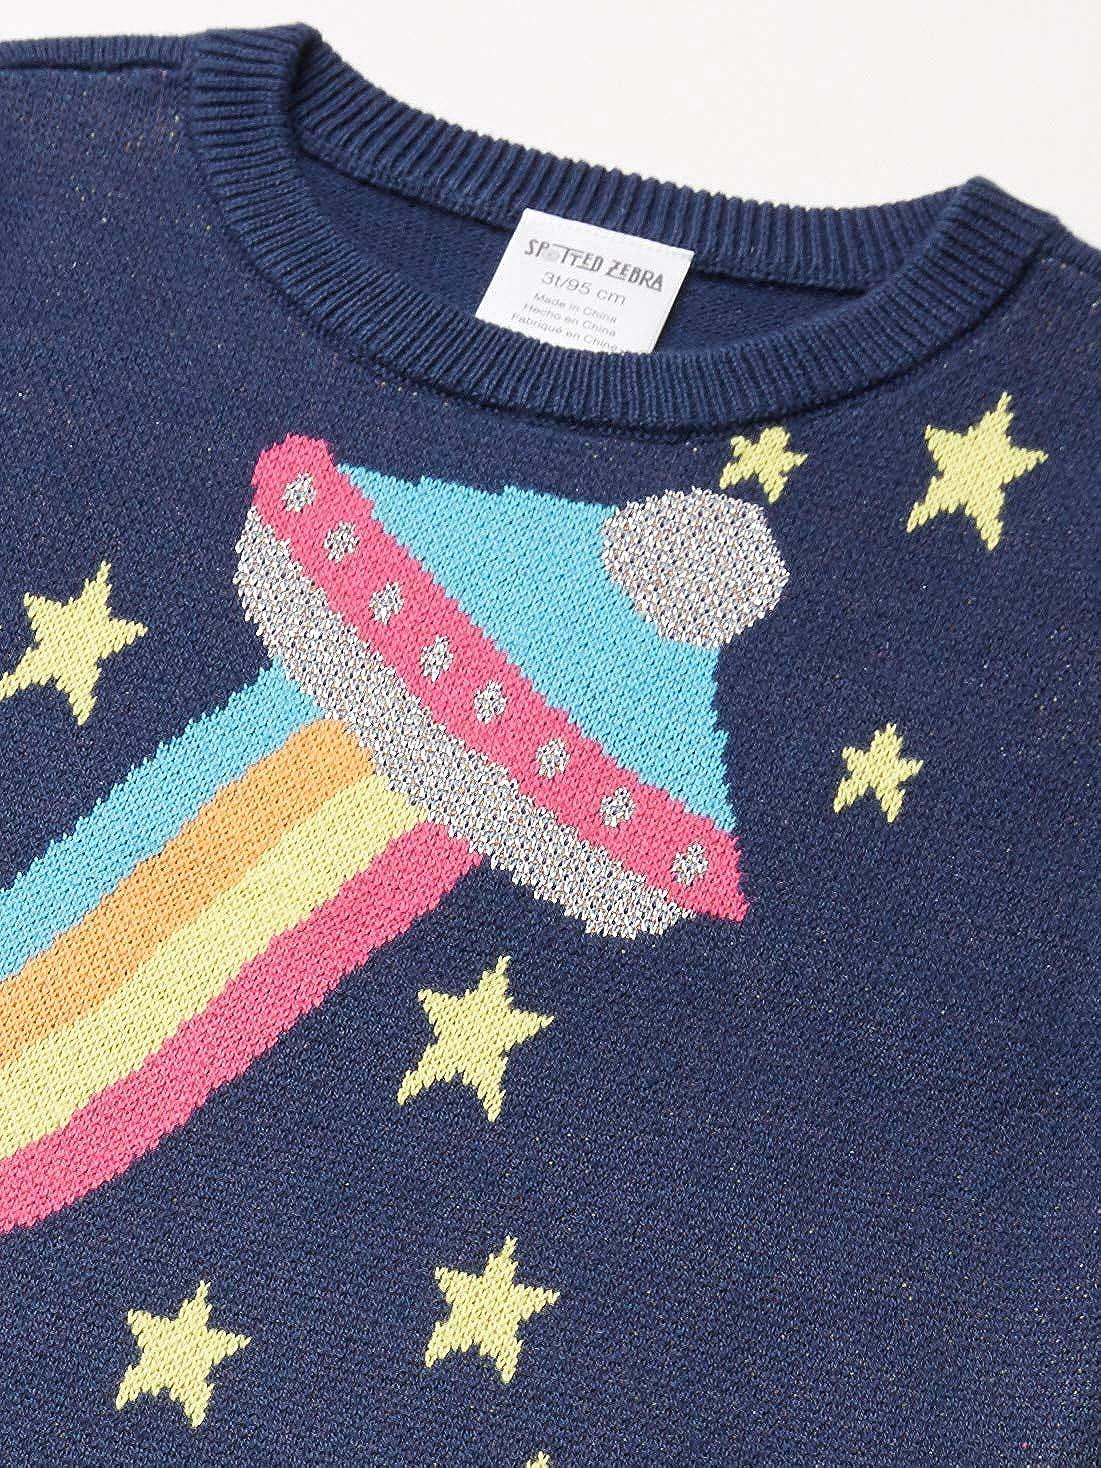 Spotted Zebra Pullover Crew Sweaters Bambina Marchio